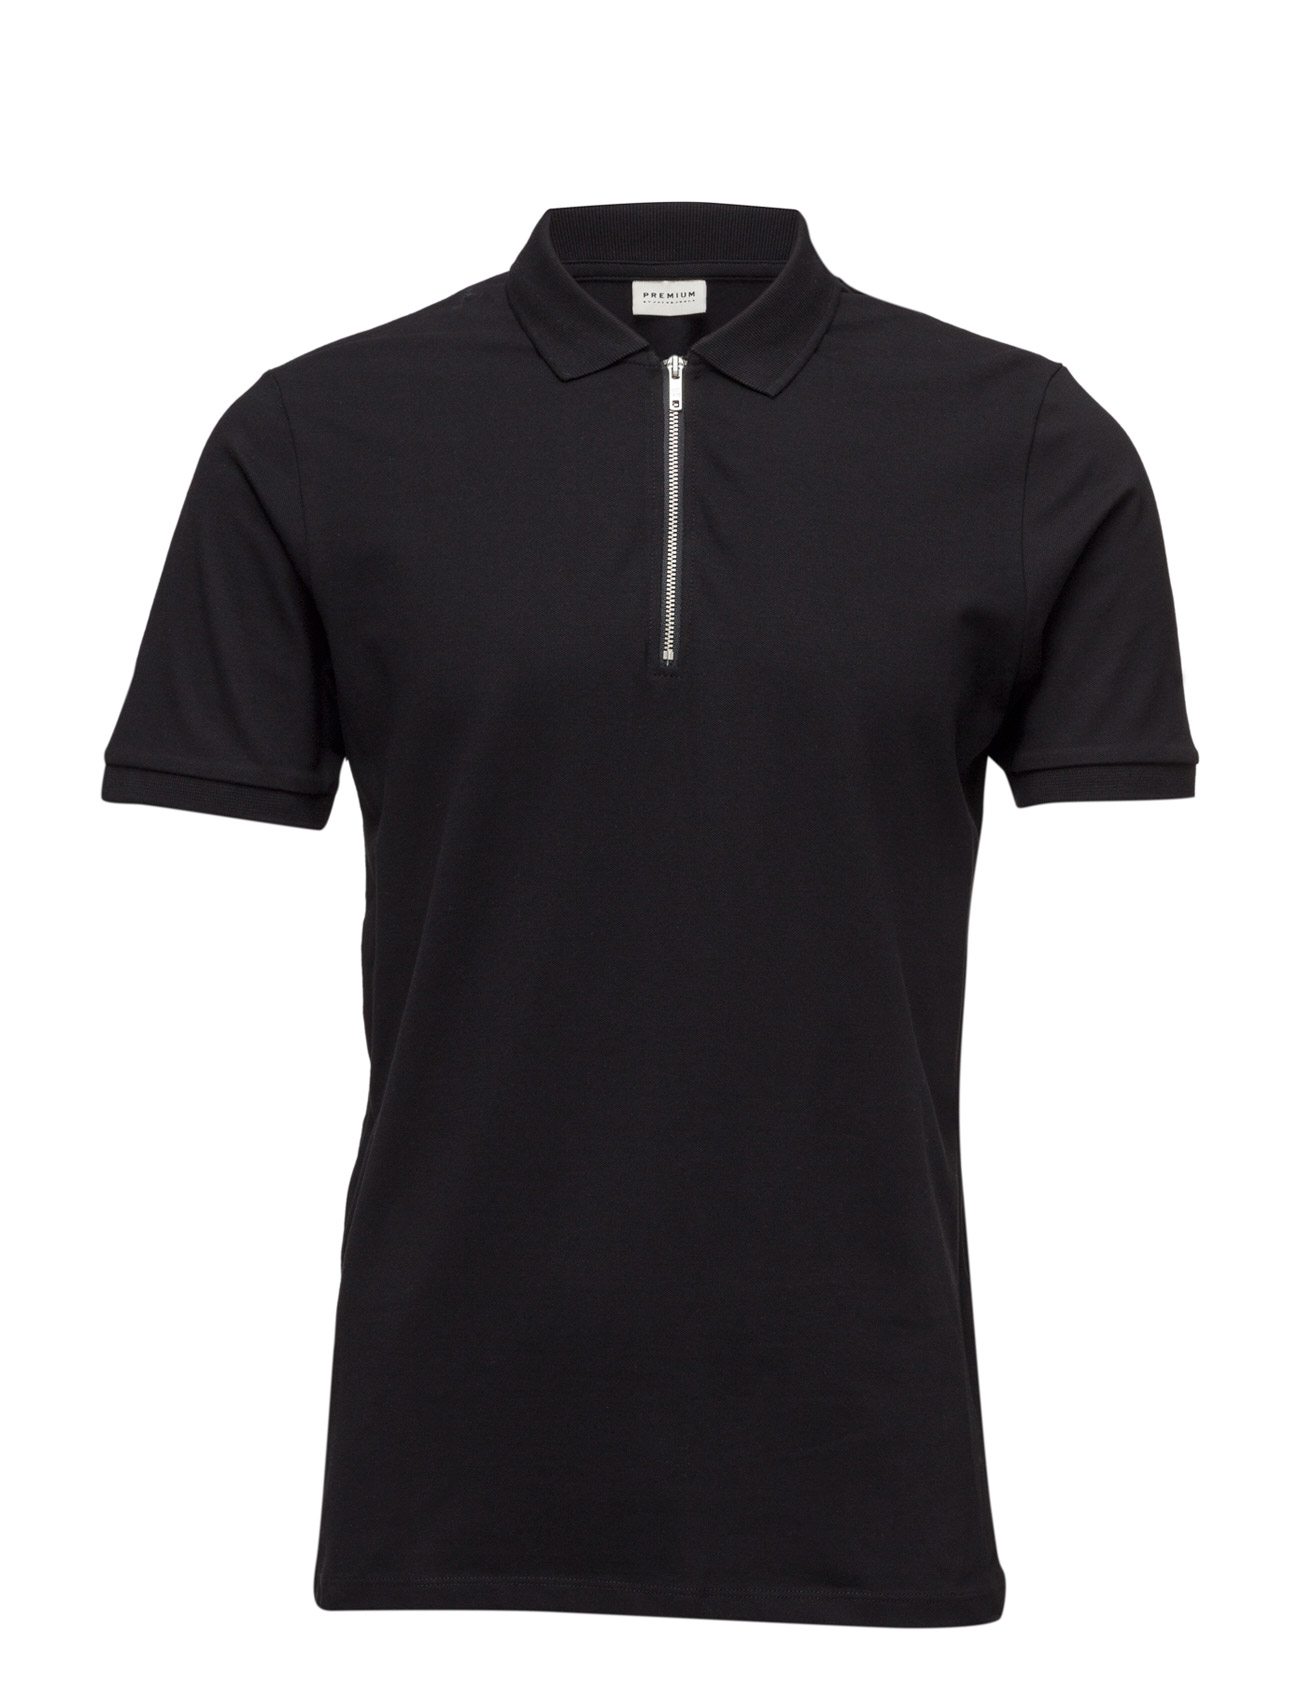 Jprzip Polo Jack & Jones Premium Kortærmede polo t-shirts til Herrer i Sort